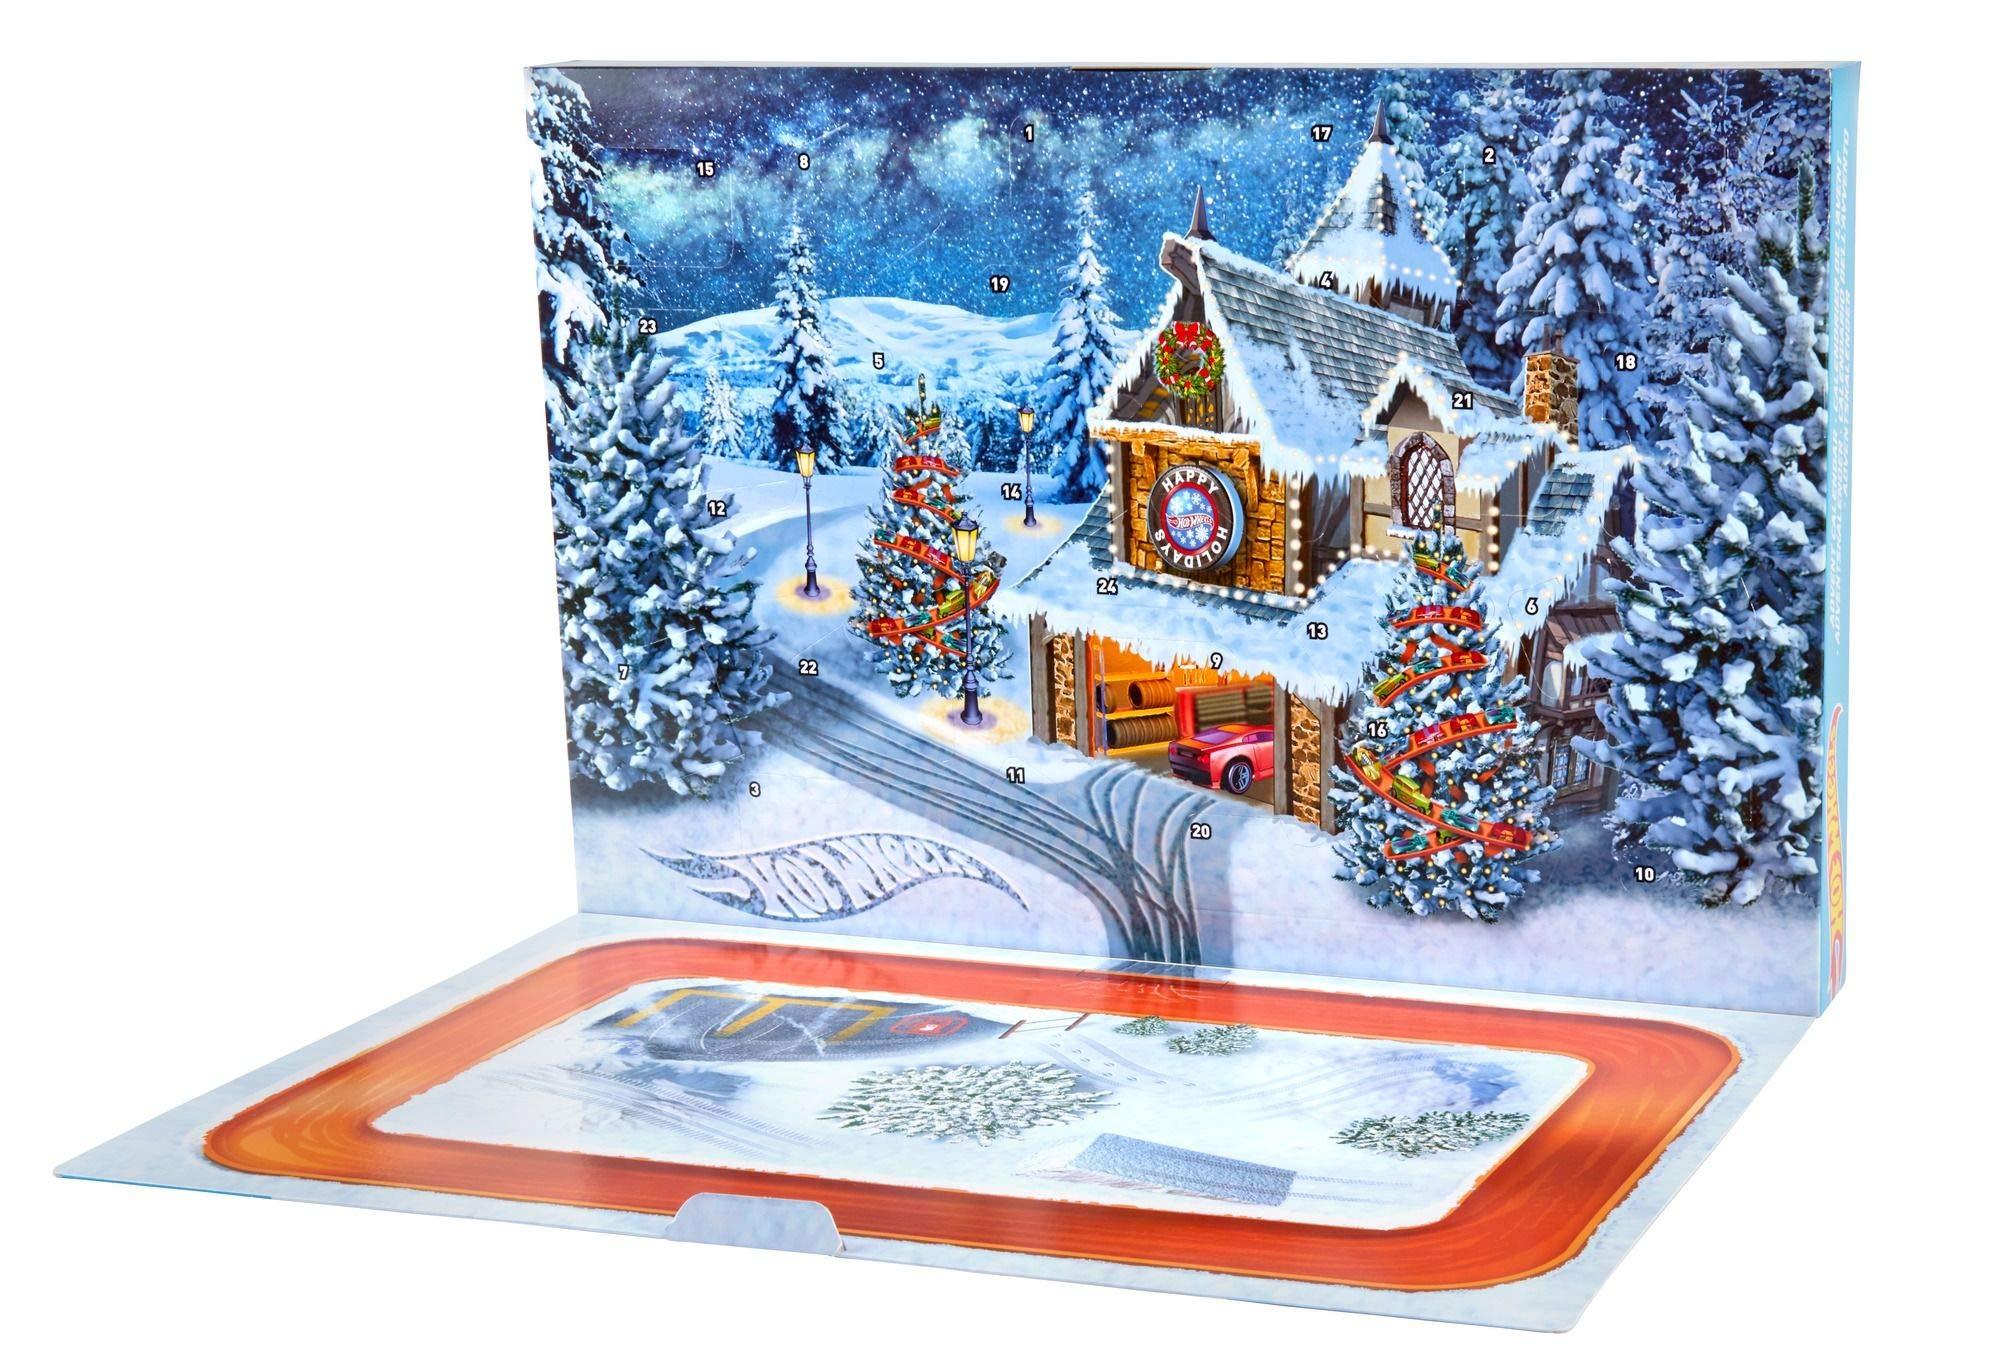 Hot Wheels Advent Calendar